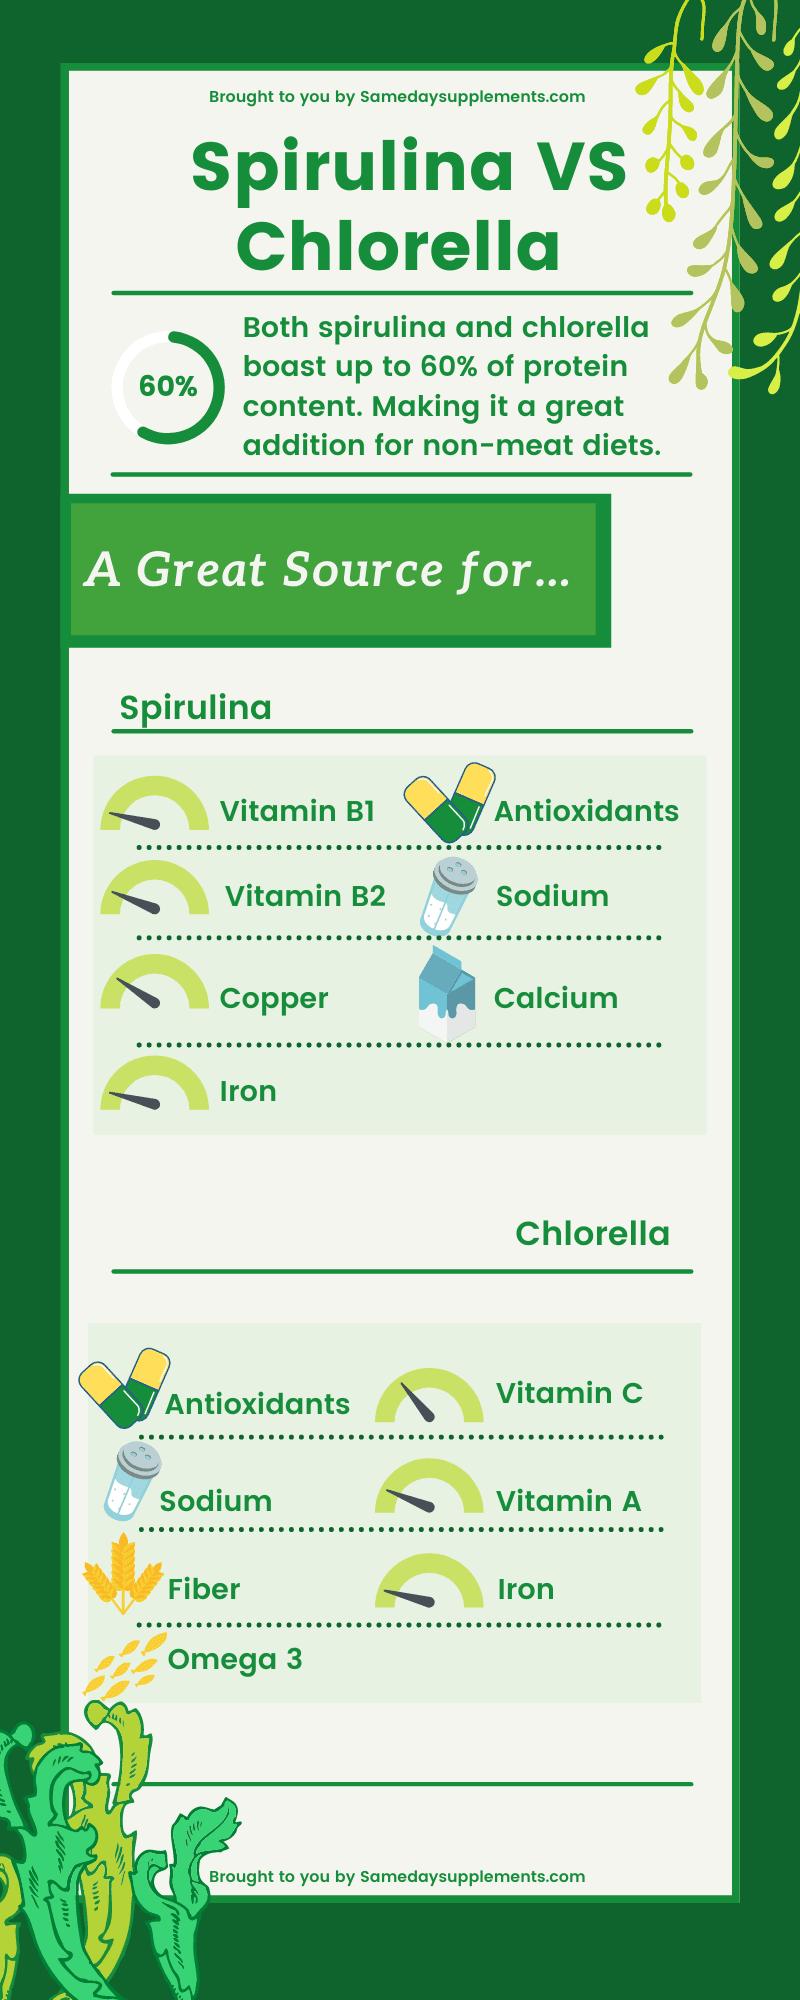 Spirulina VS Chlorella